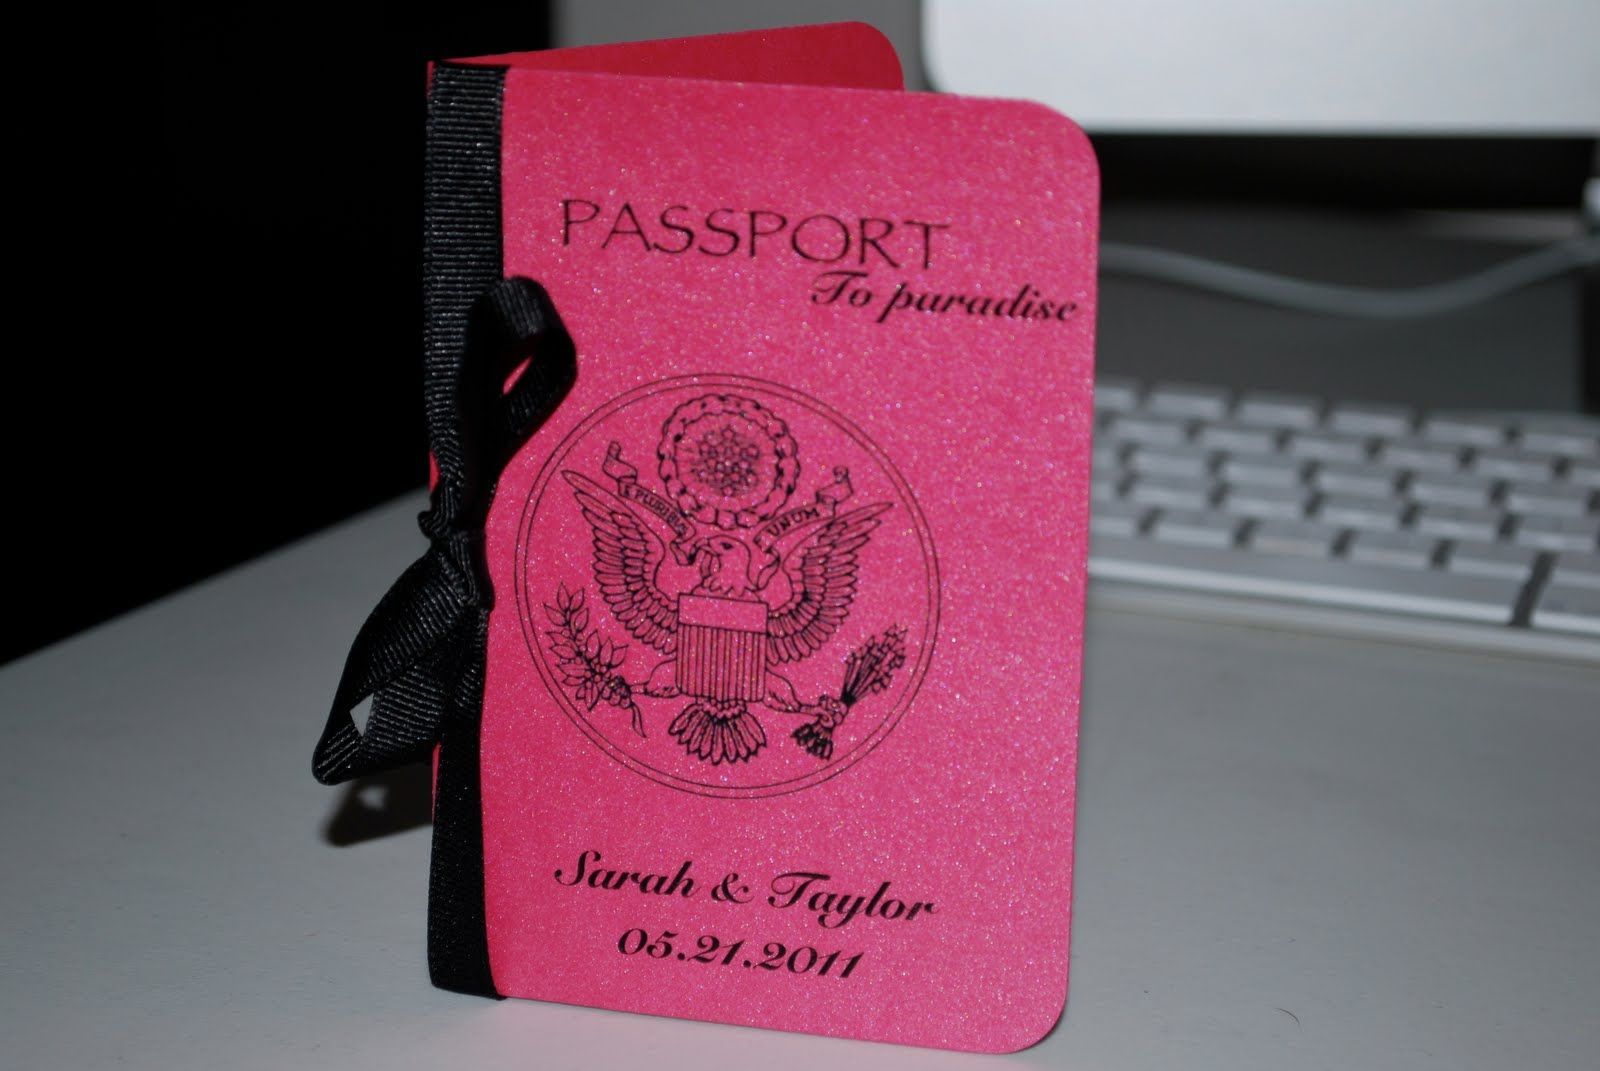 Passport wedding invitations duvys designs passport wedding passport wedding invitations duvys designs passport wedding invitations stopboris Choice Image